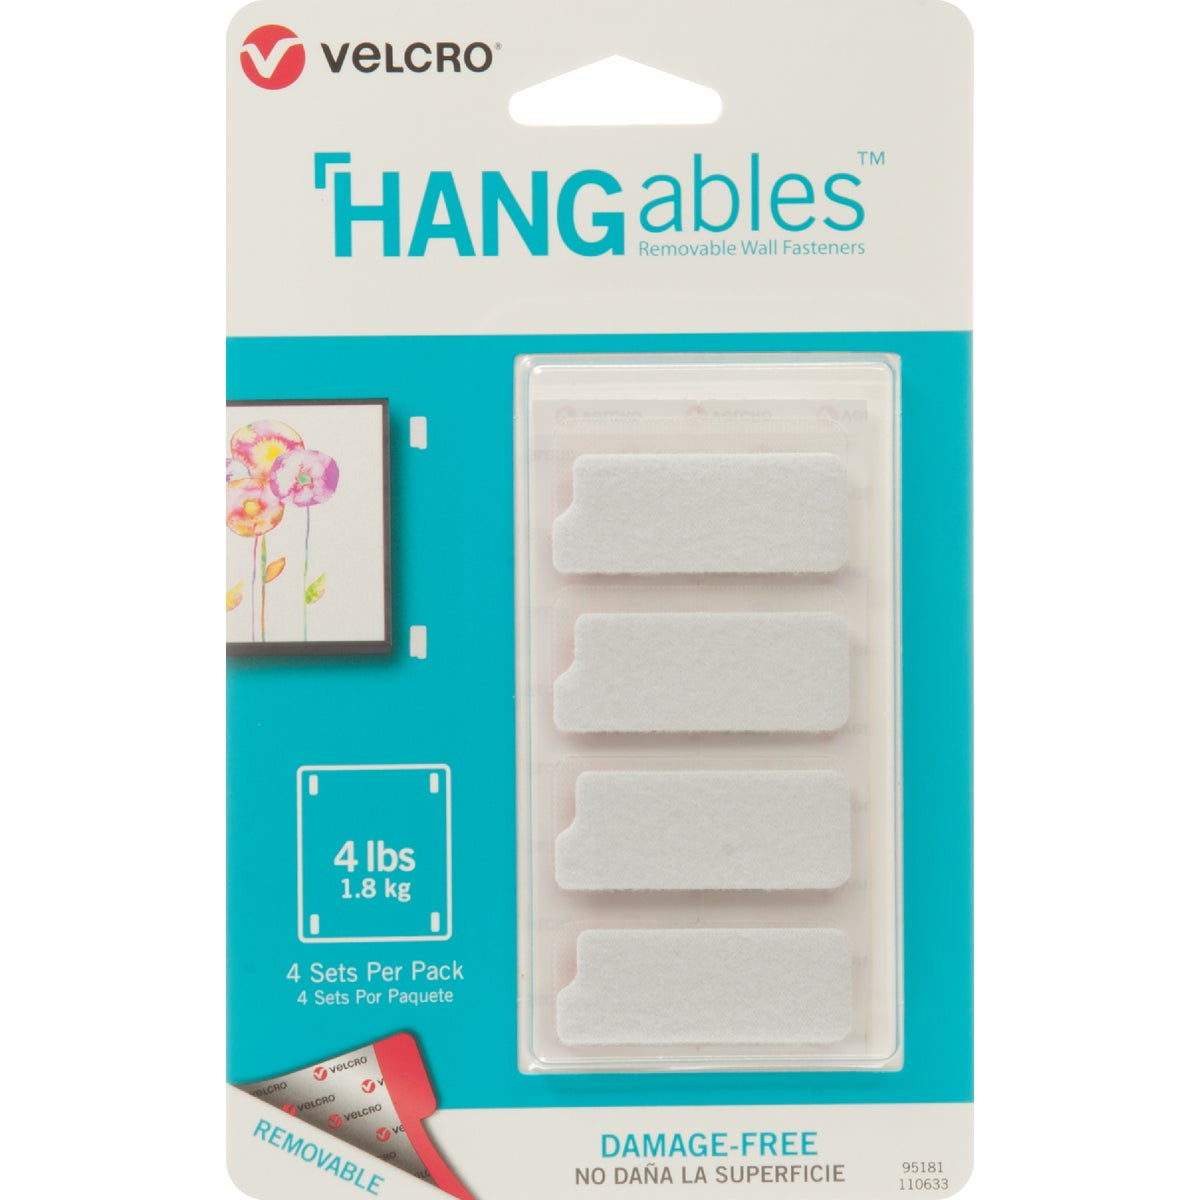 VELCRO Brand Hangables Removable Hook & Loop Strip